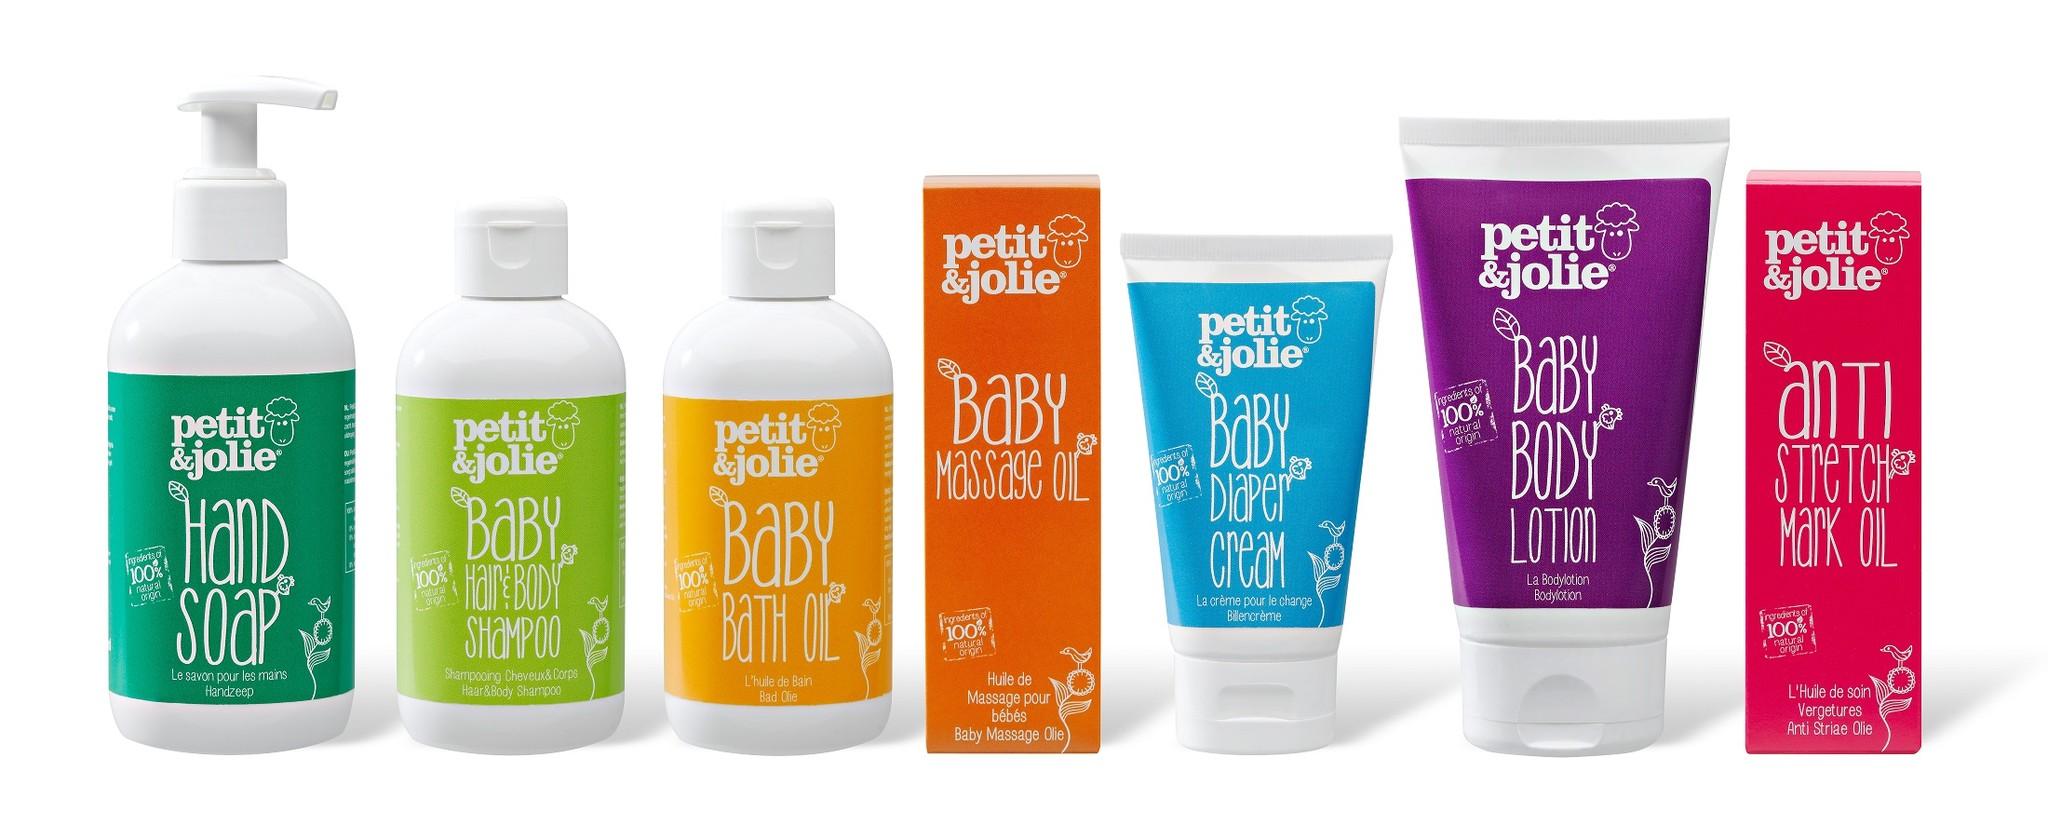 Petit & Jolie baby